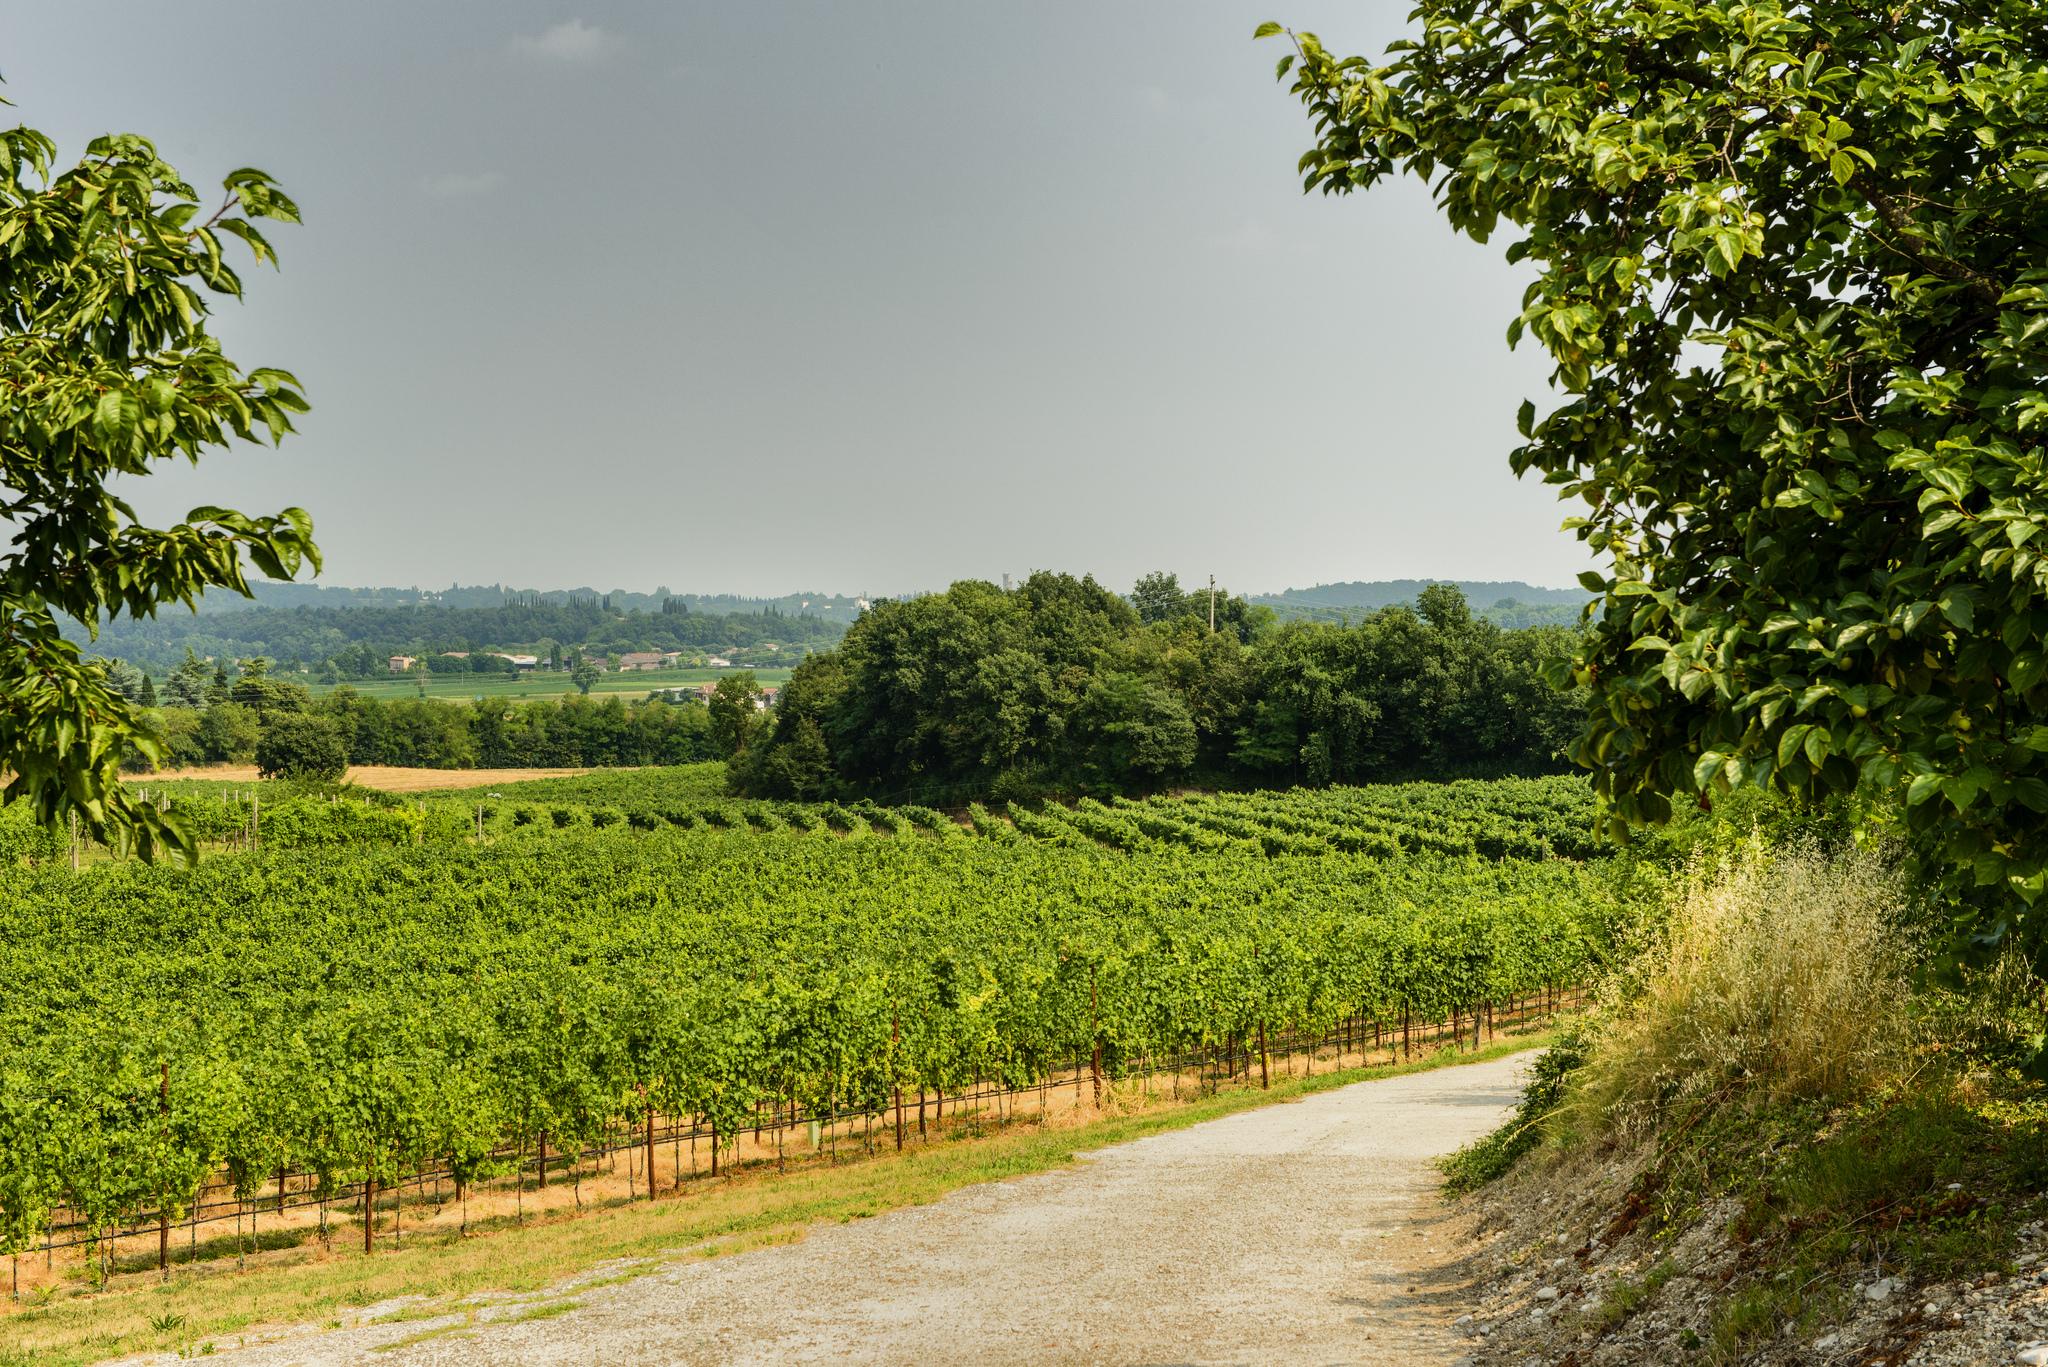 10 Reasons why you should visit Virginia's Shenandoah Valley! Beautiful east coast USA getaway | GoSeekExplore.com